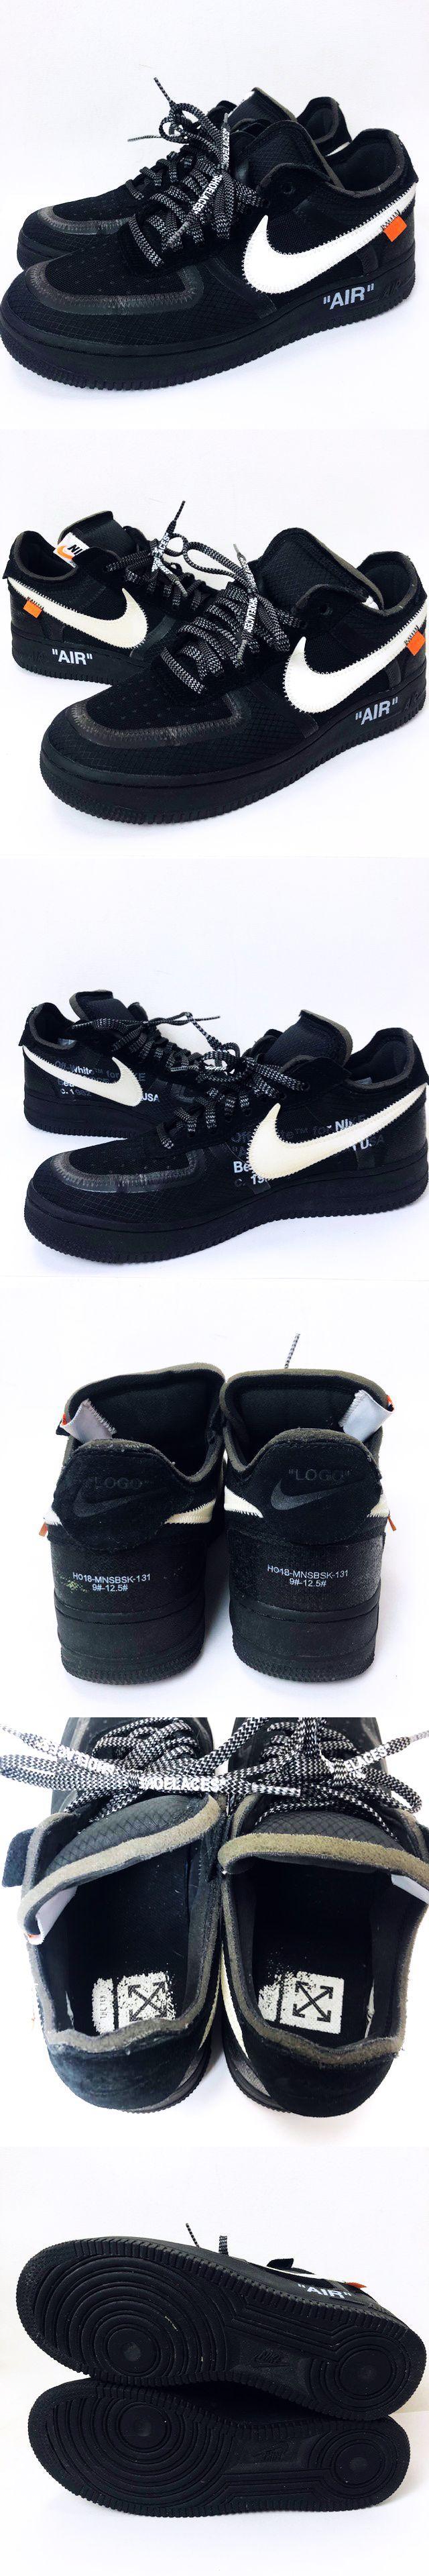 ★AA☆OFF WHITE THE 10 AIR FORCE 1 LOW BLACK AO4606-001 US9.5 27.5cm オフホワイト エアフォース 1 ロー スニーカー 靴 黒